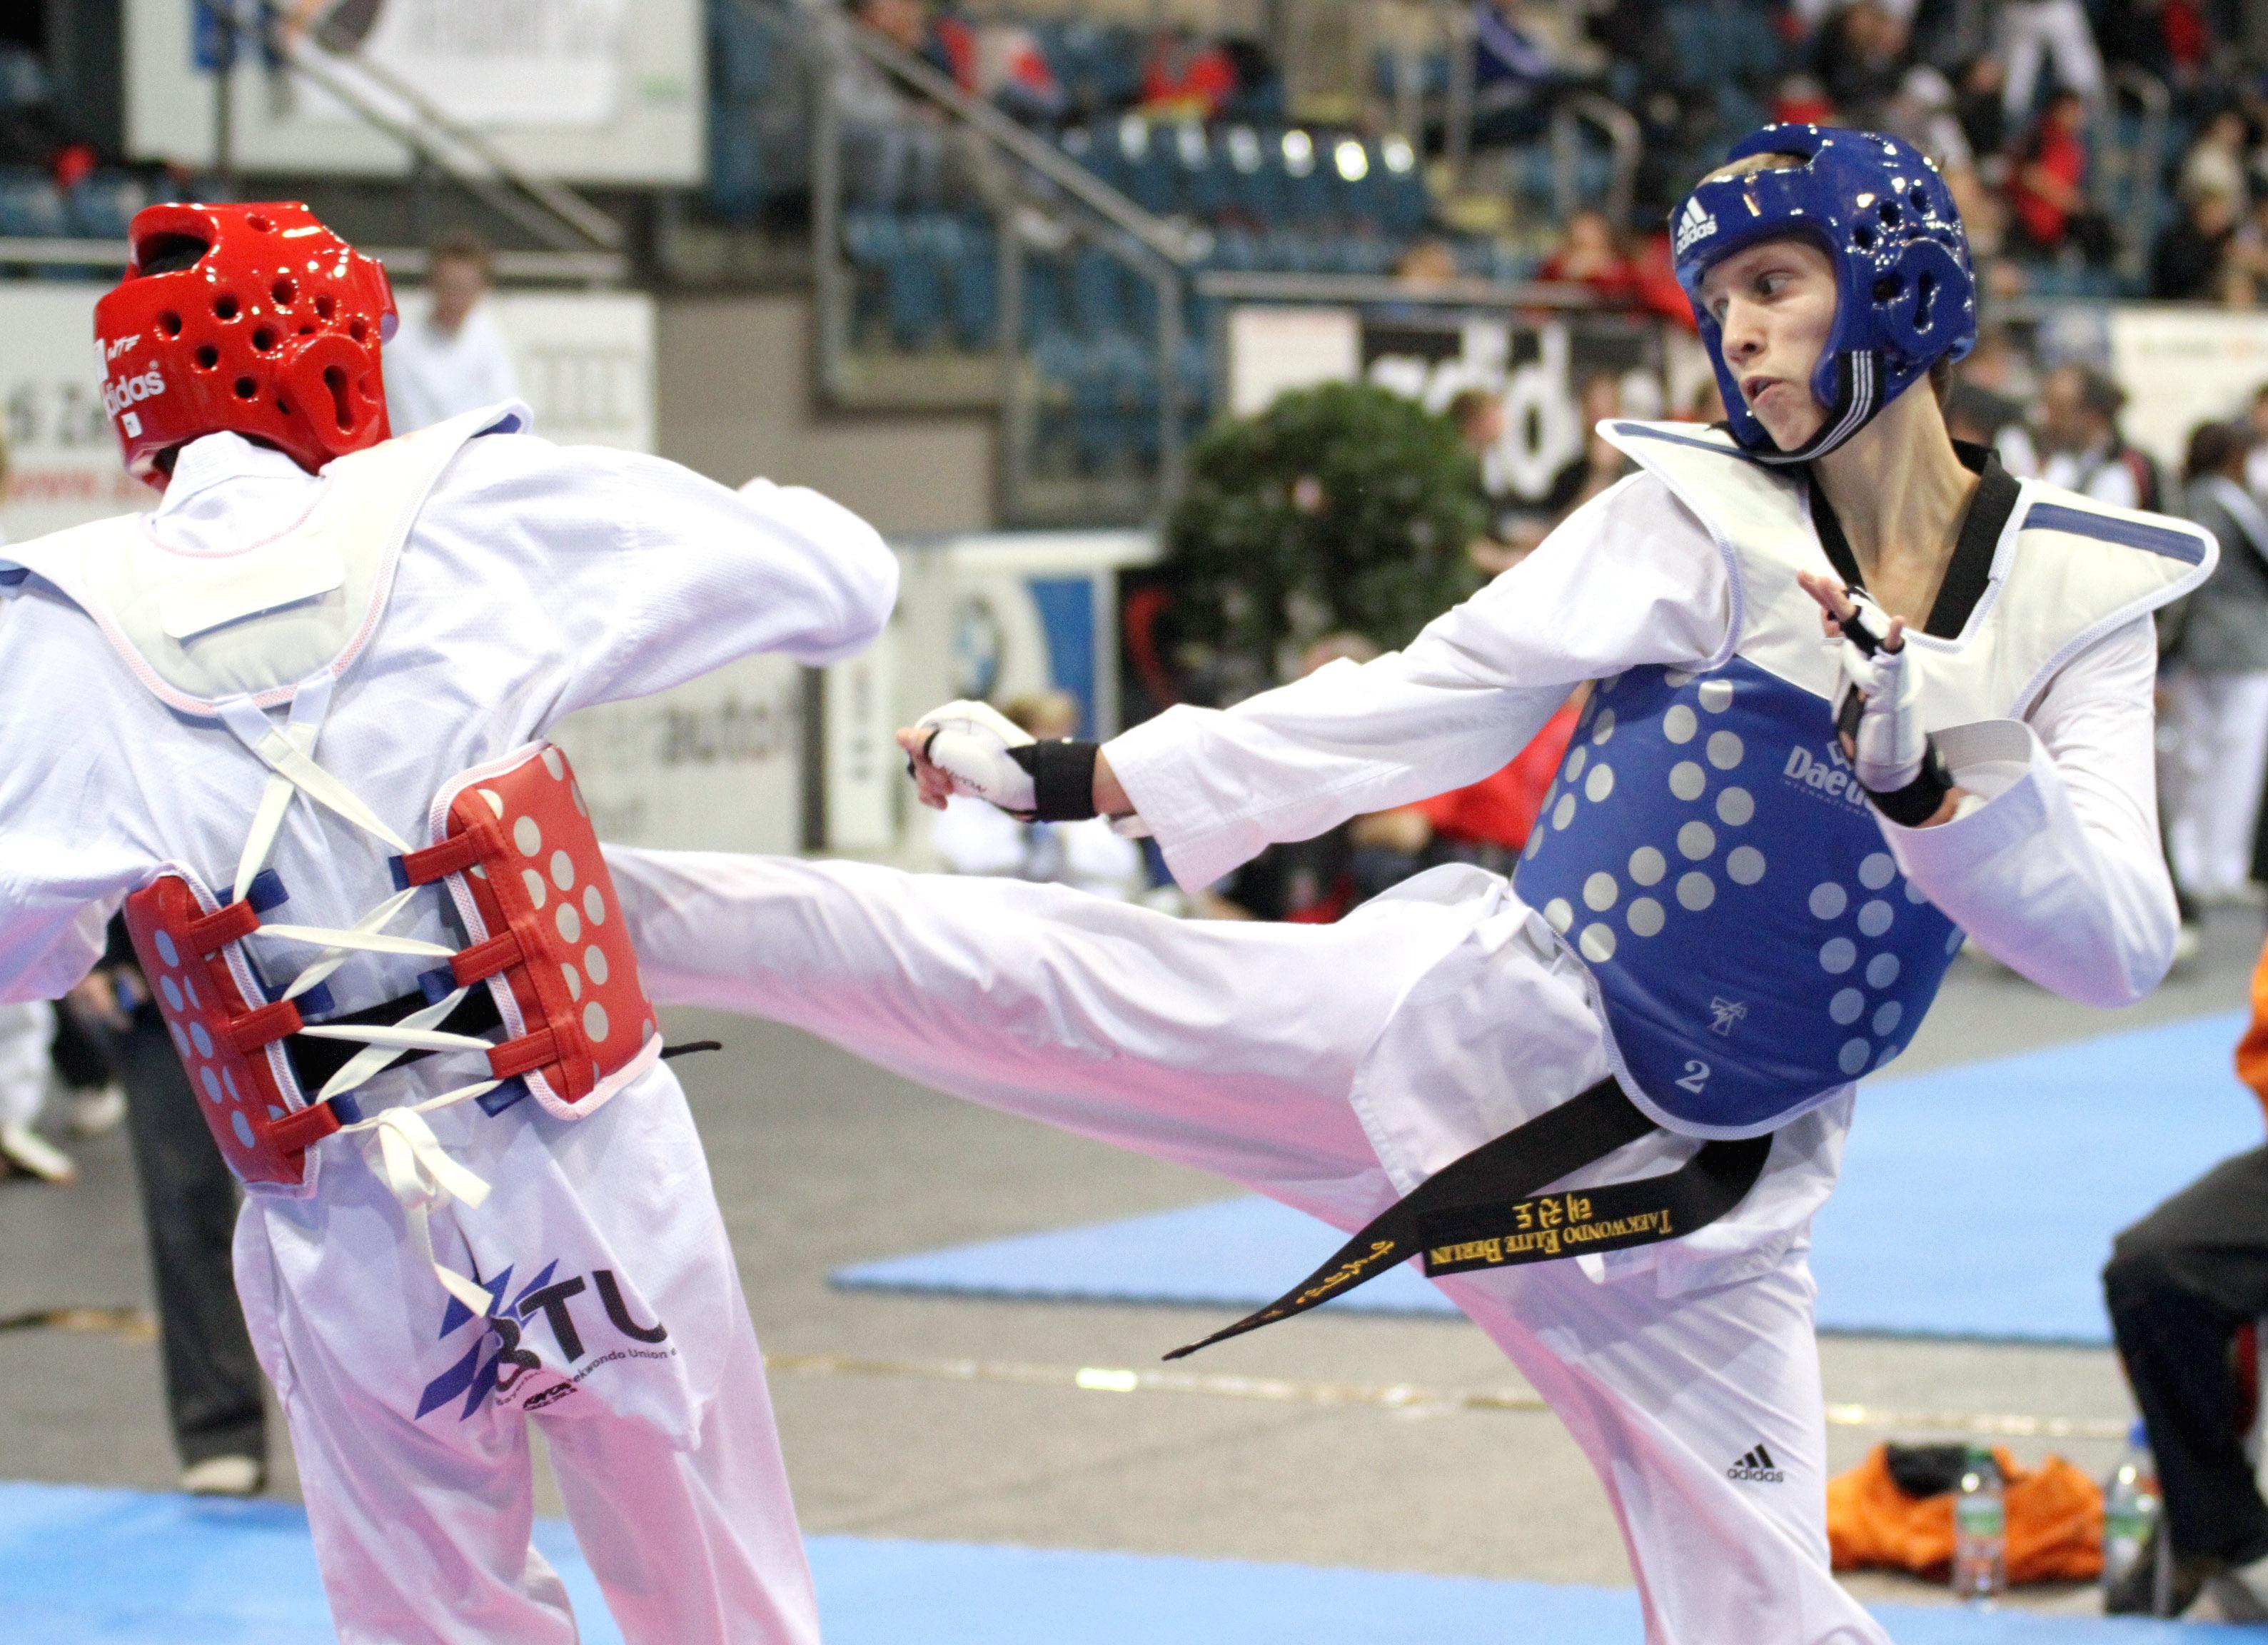 Taekwondo?